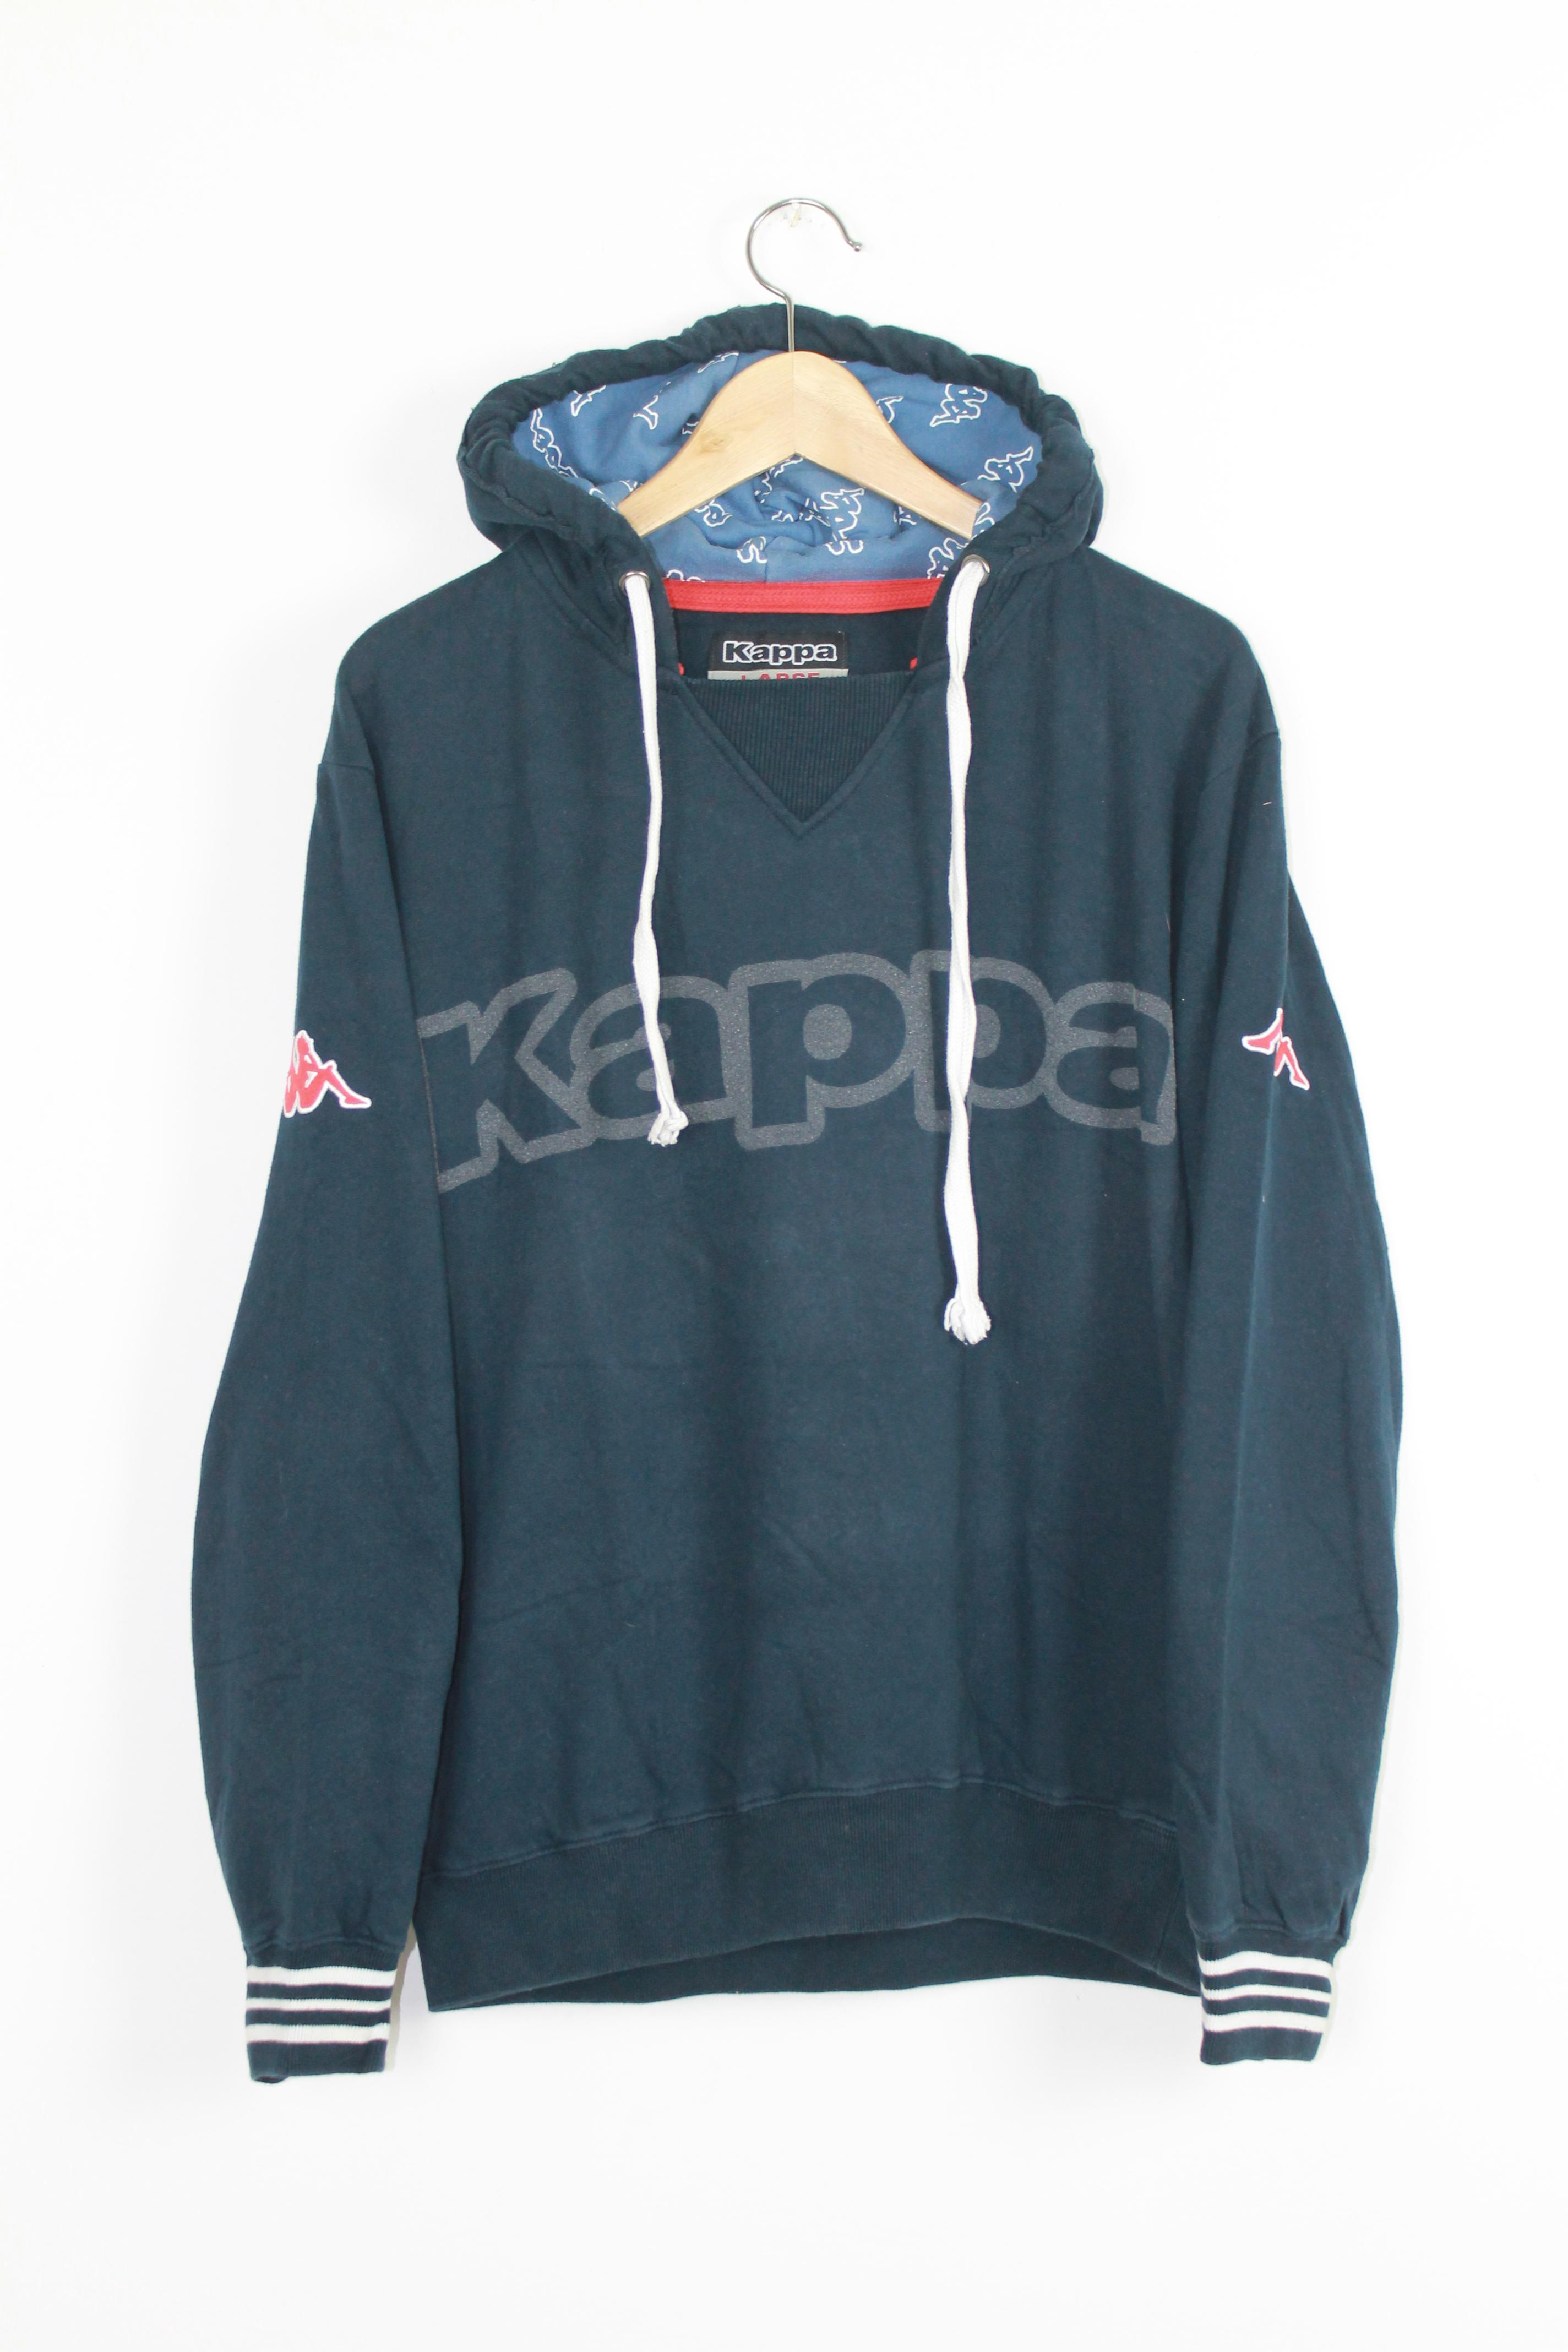 Kappa - Felpa cappuccio